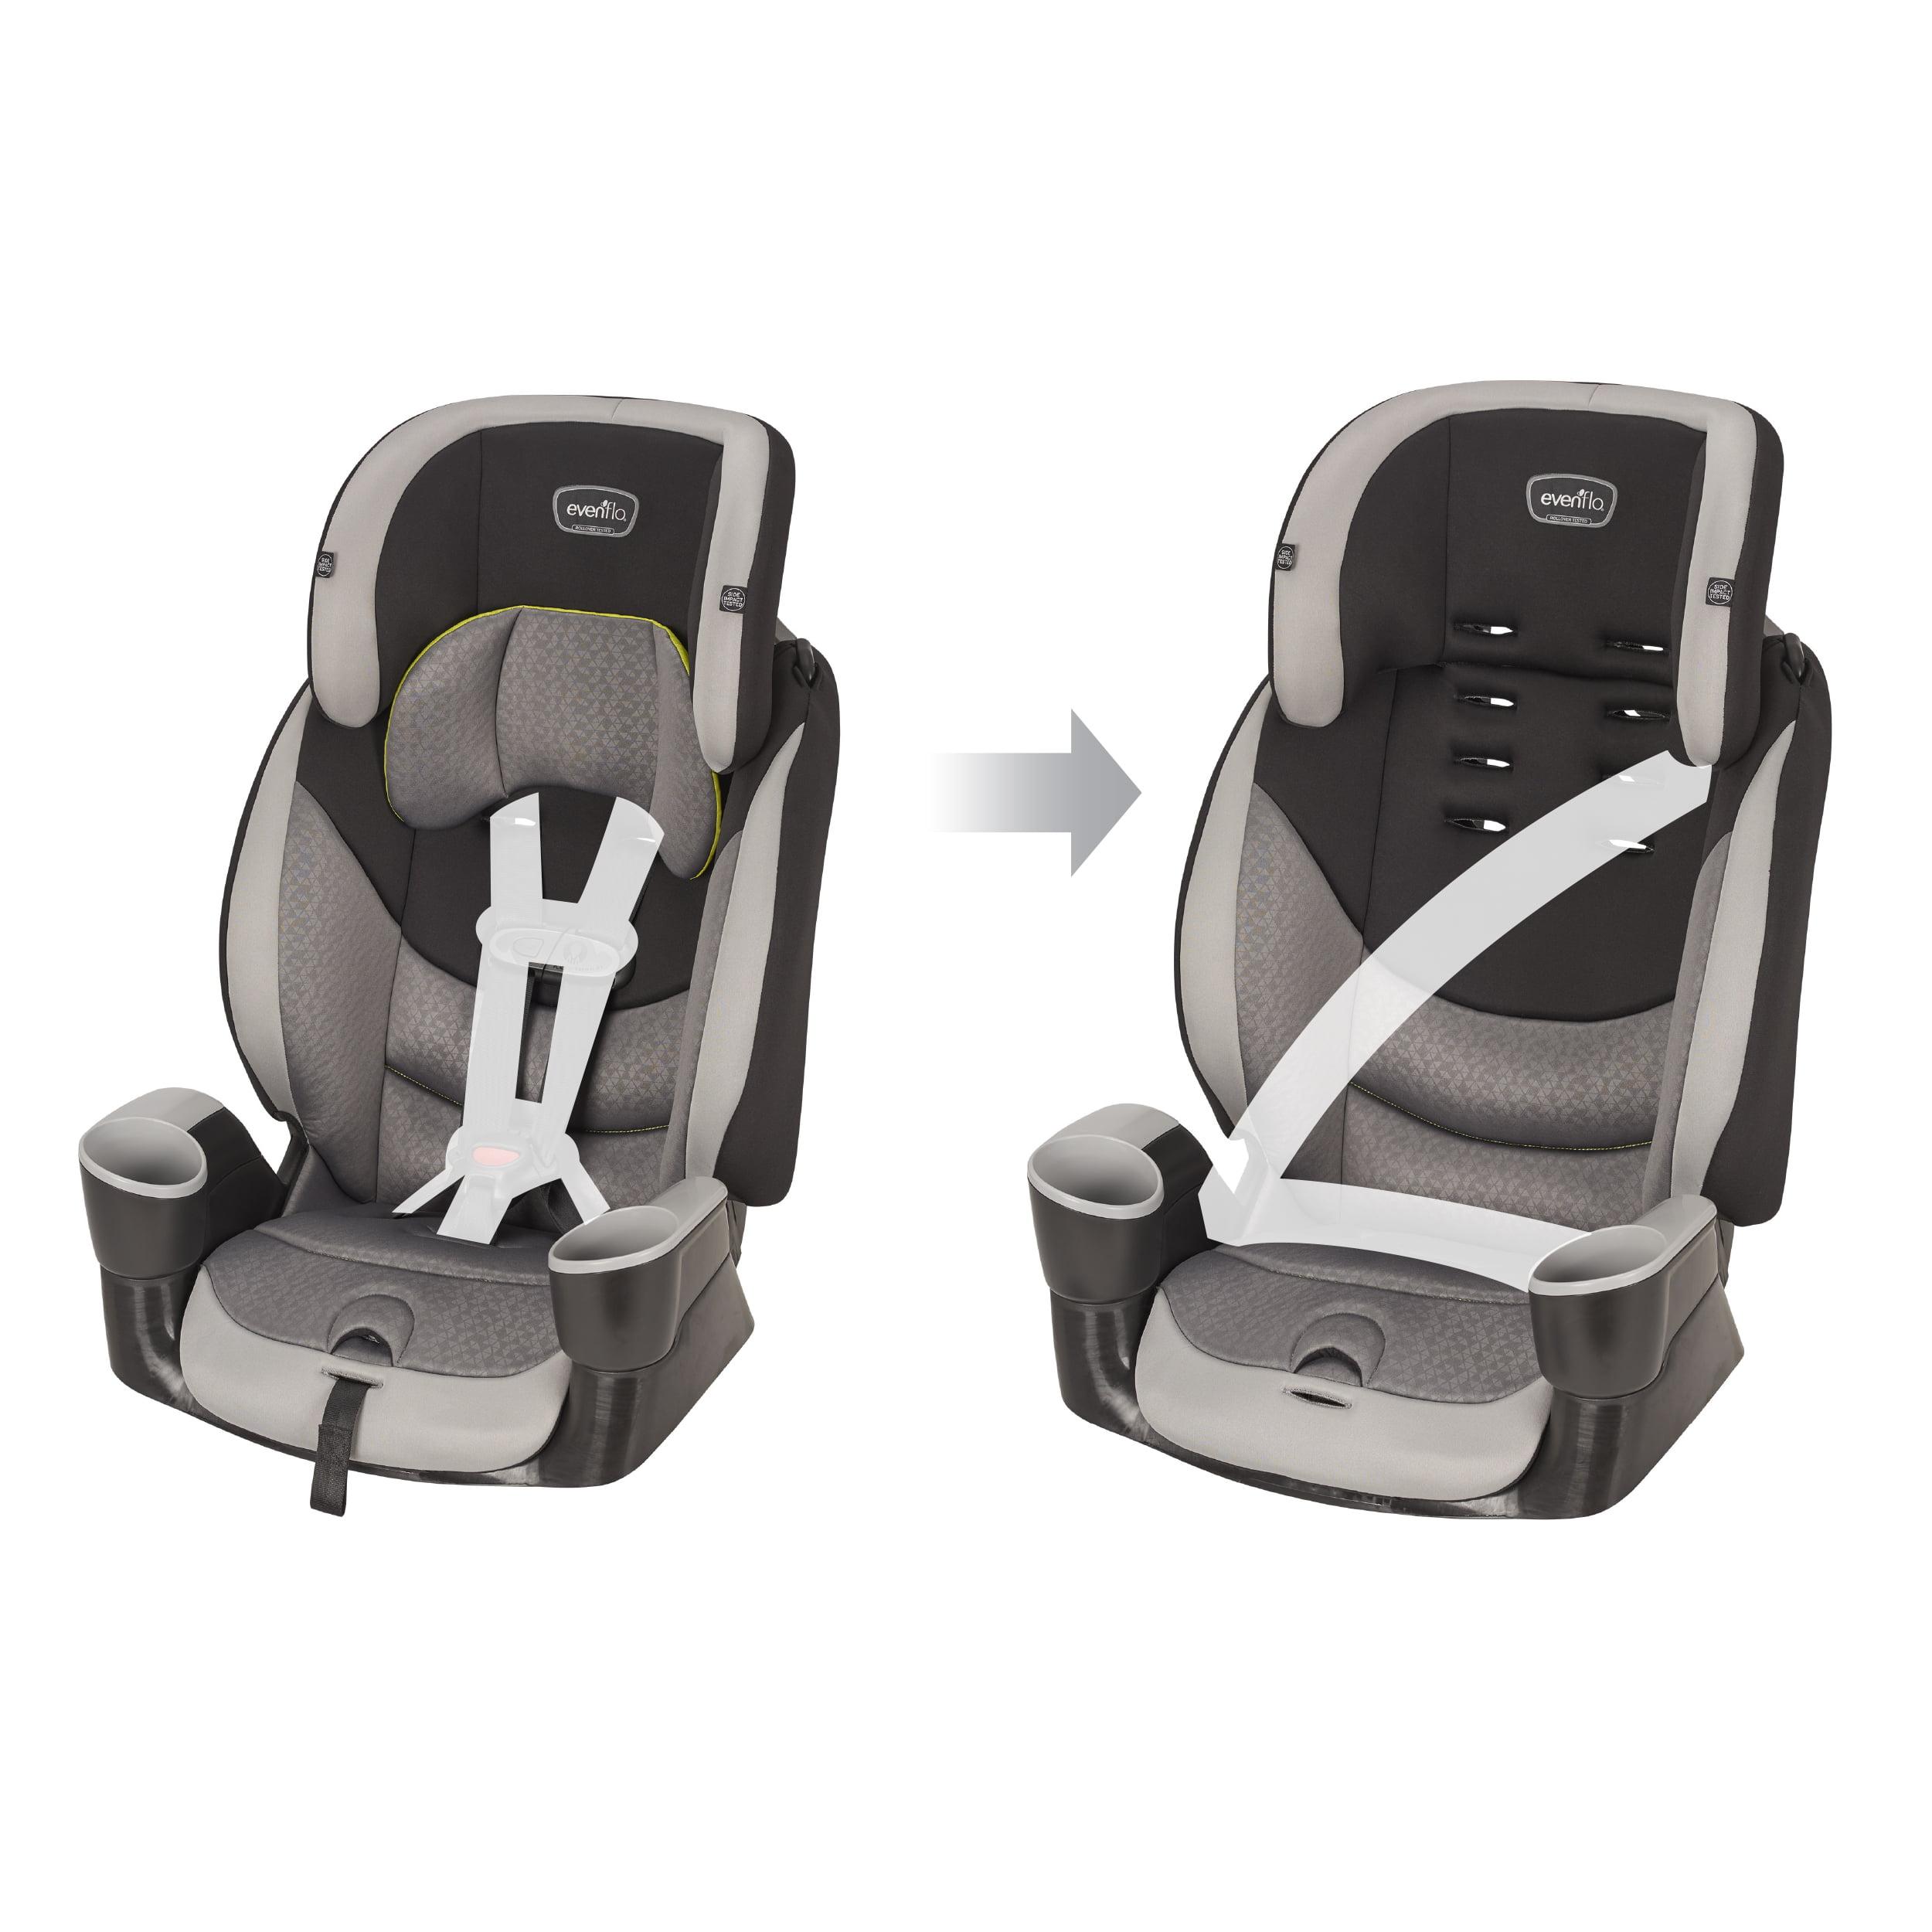 Evenflo Maestro Sport Harness Booster Car Seat Crestone Peaks 34912258